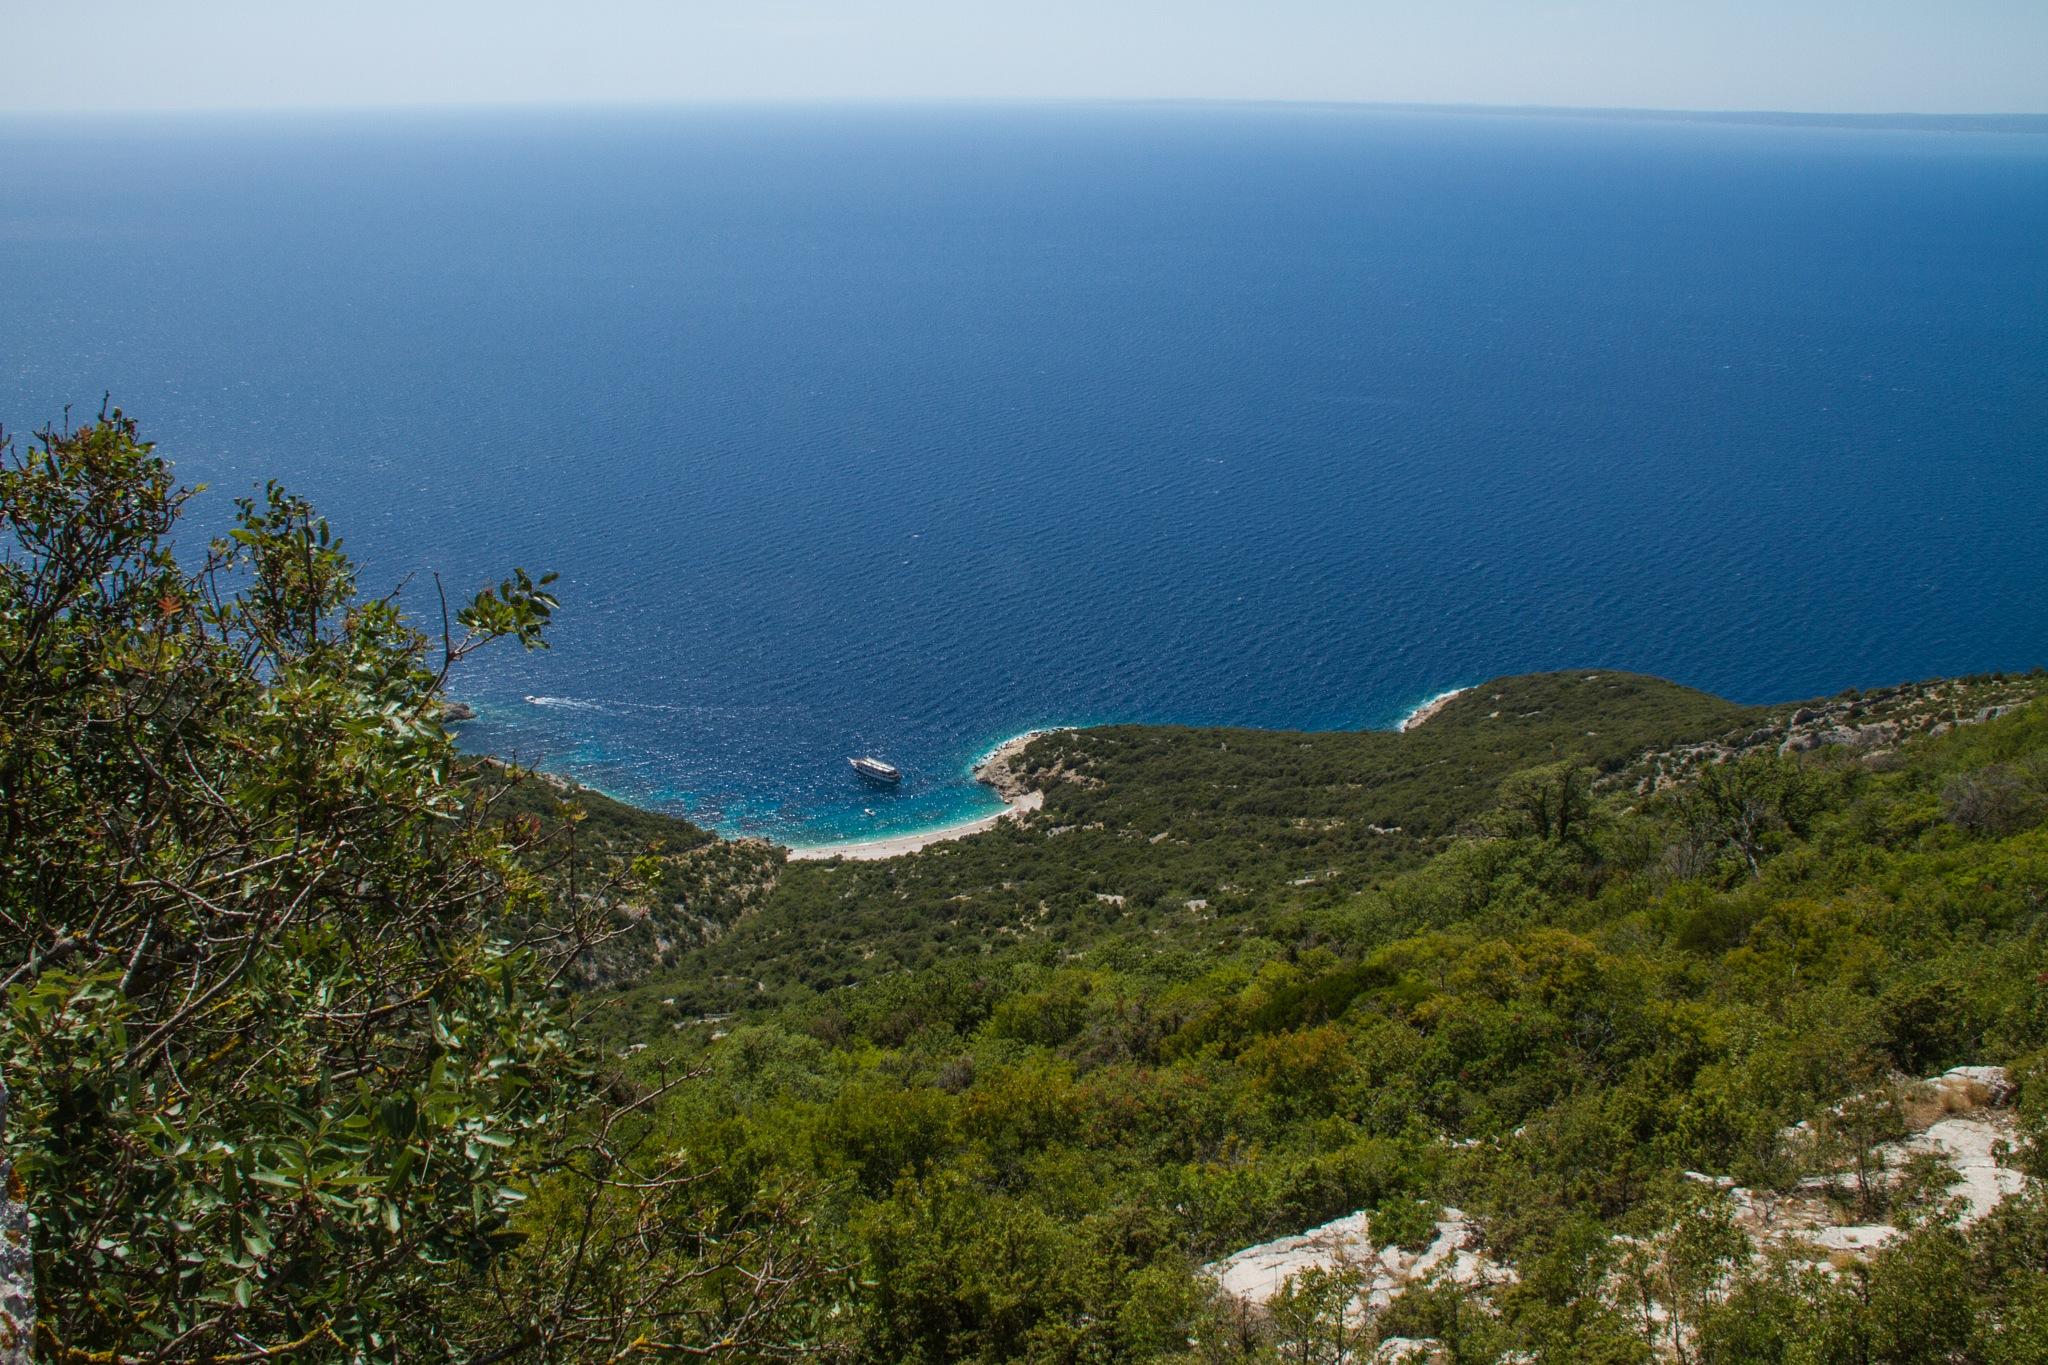 Small beaches and the blue ocean by Bjarne Gertz Pedersen